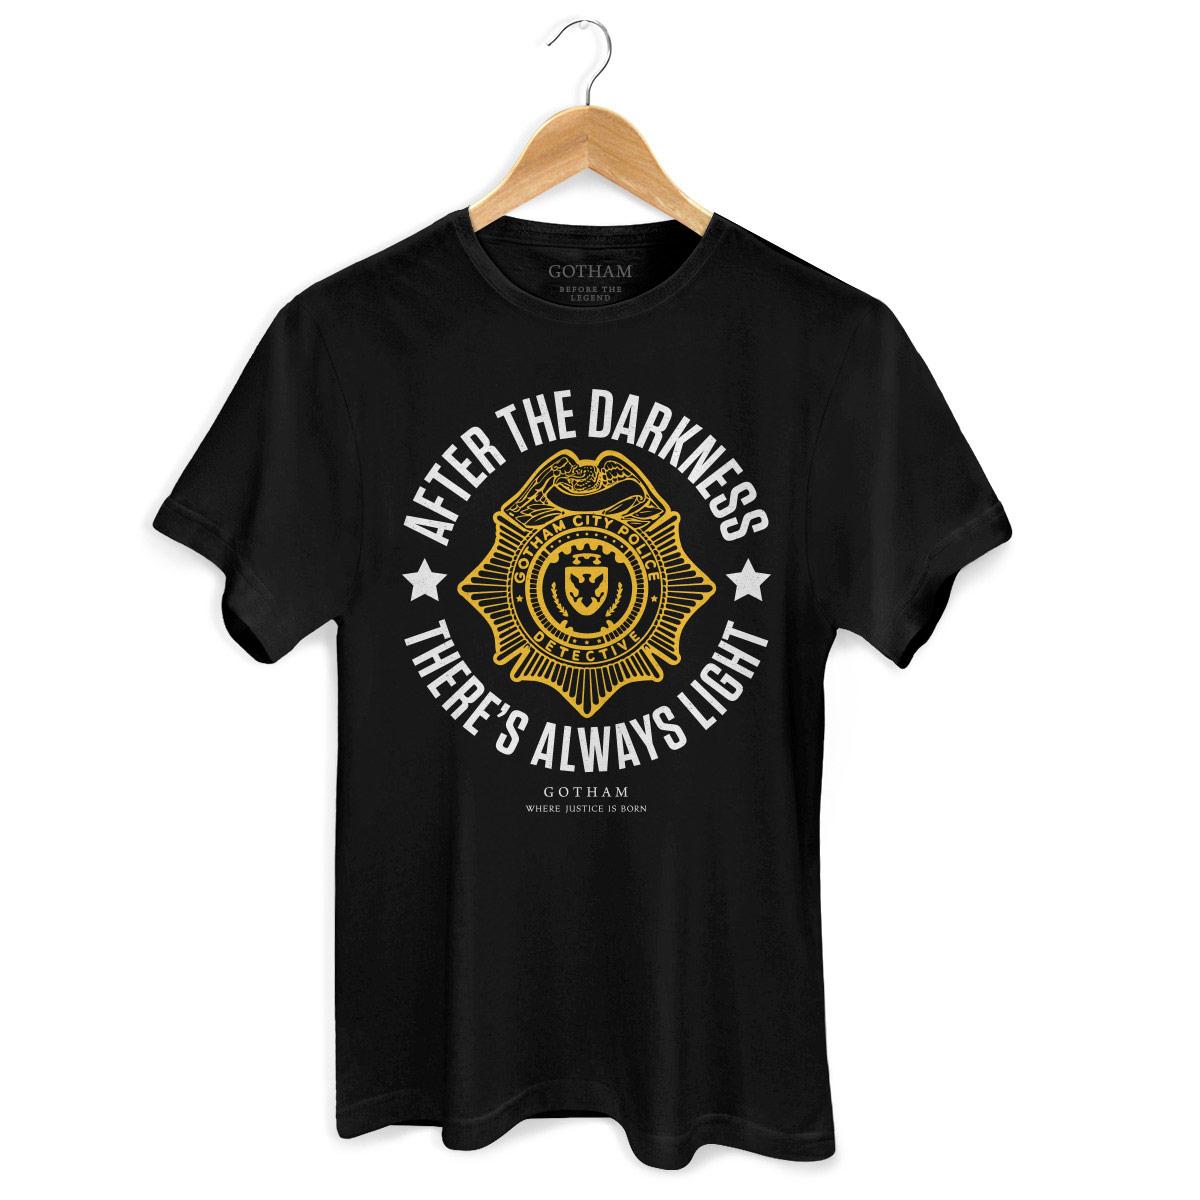 Camiseta Masculina Gotham There´s Always Light